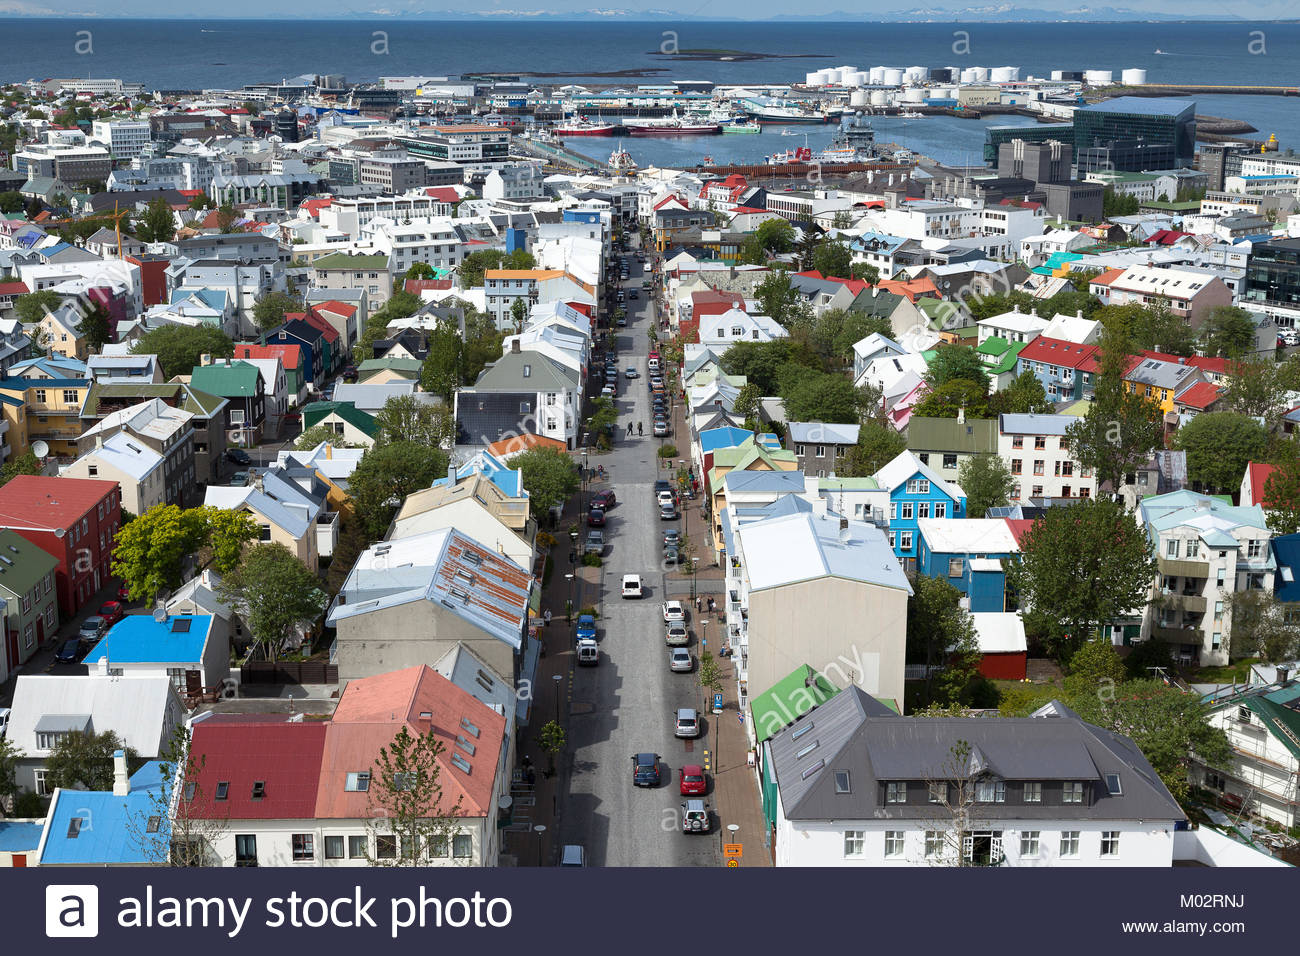 bird's eye view of Reykjavik with concert hall HARPA and the main road Skólavörðustígur - Stock Image